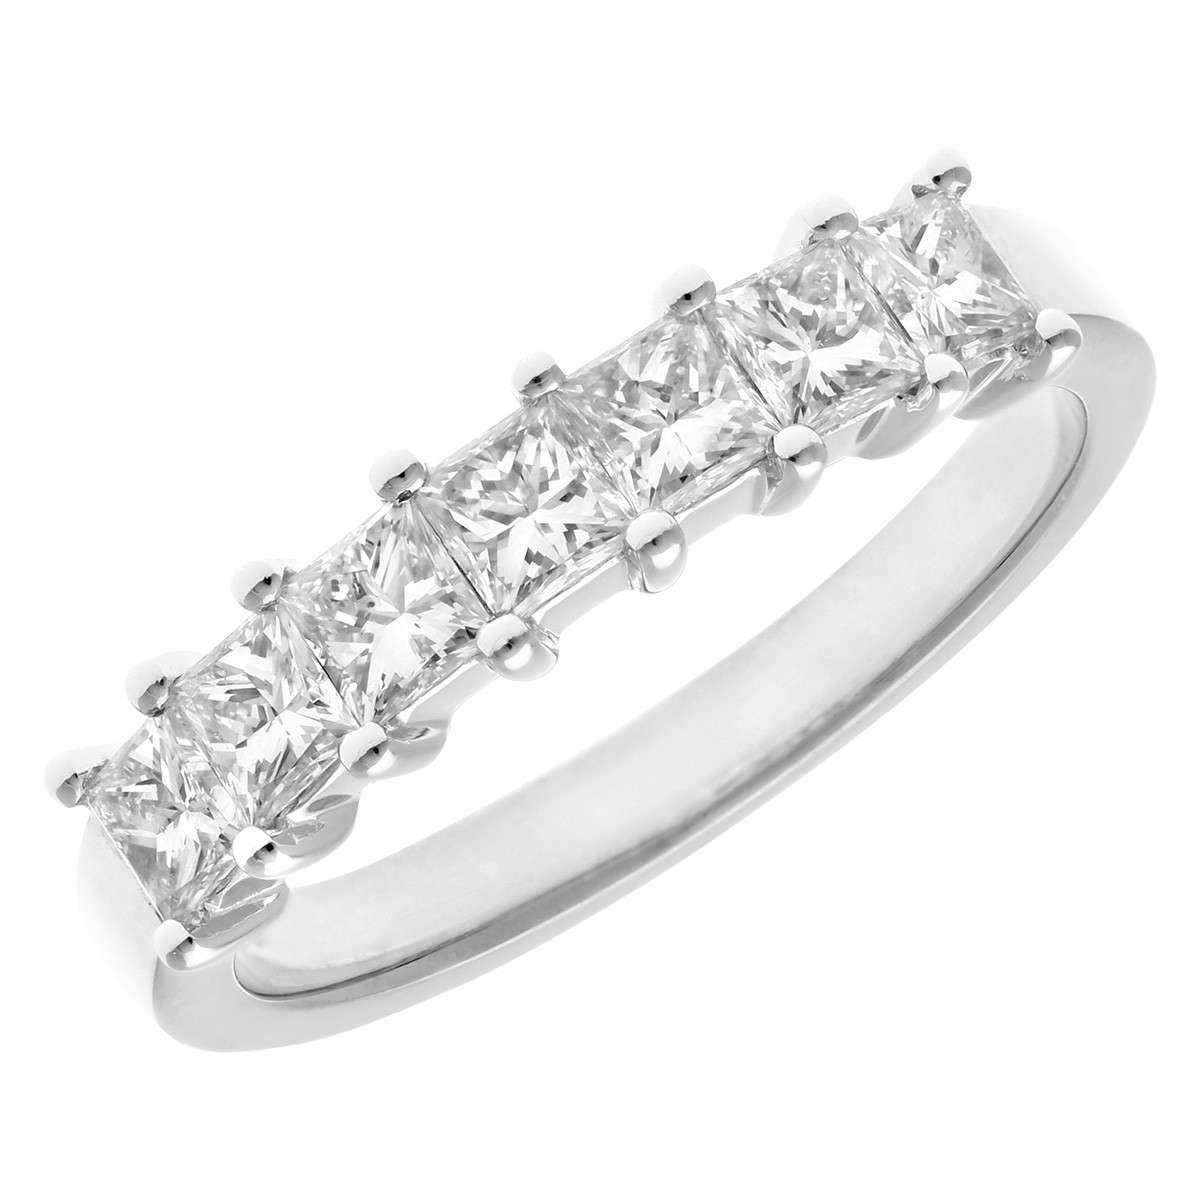 18CT WHITE GOLD 1.00CT DIAMOND PRINCESS CUT 7 STONE 1/2 ETERNITY RING